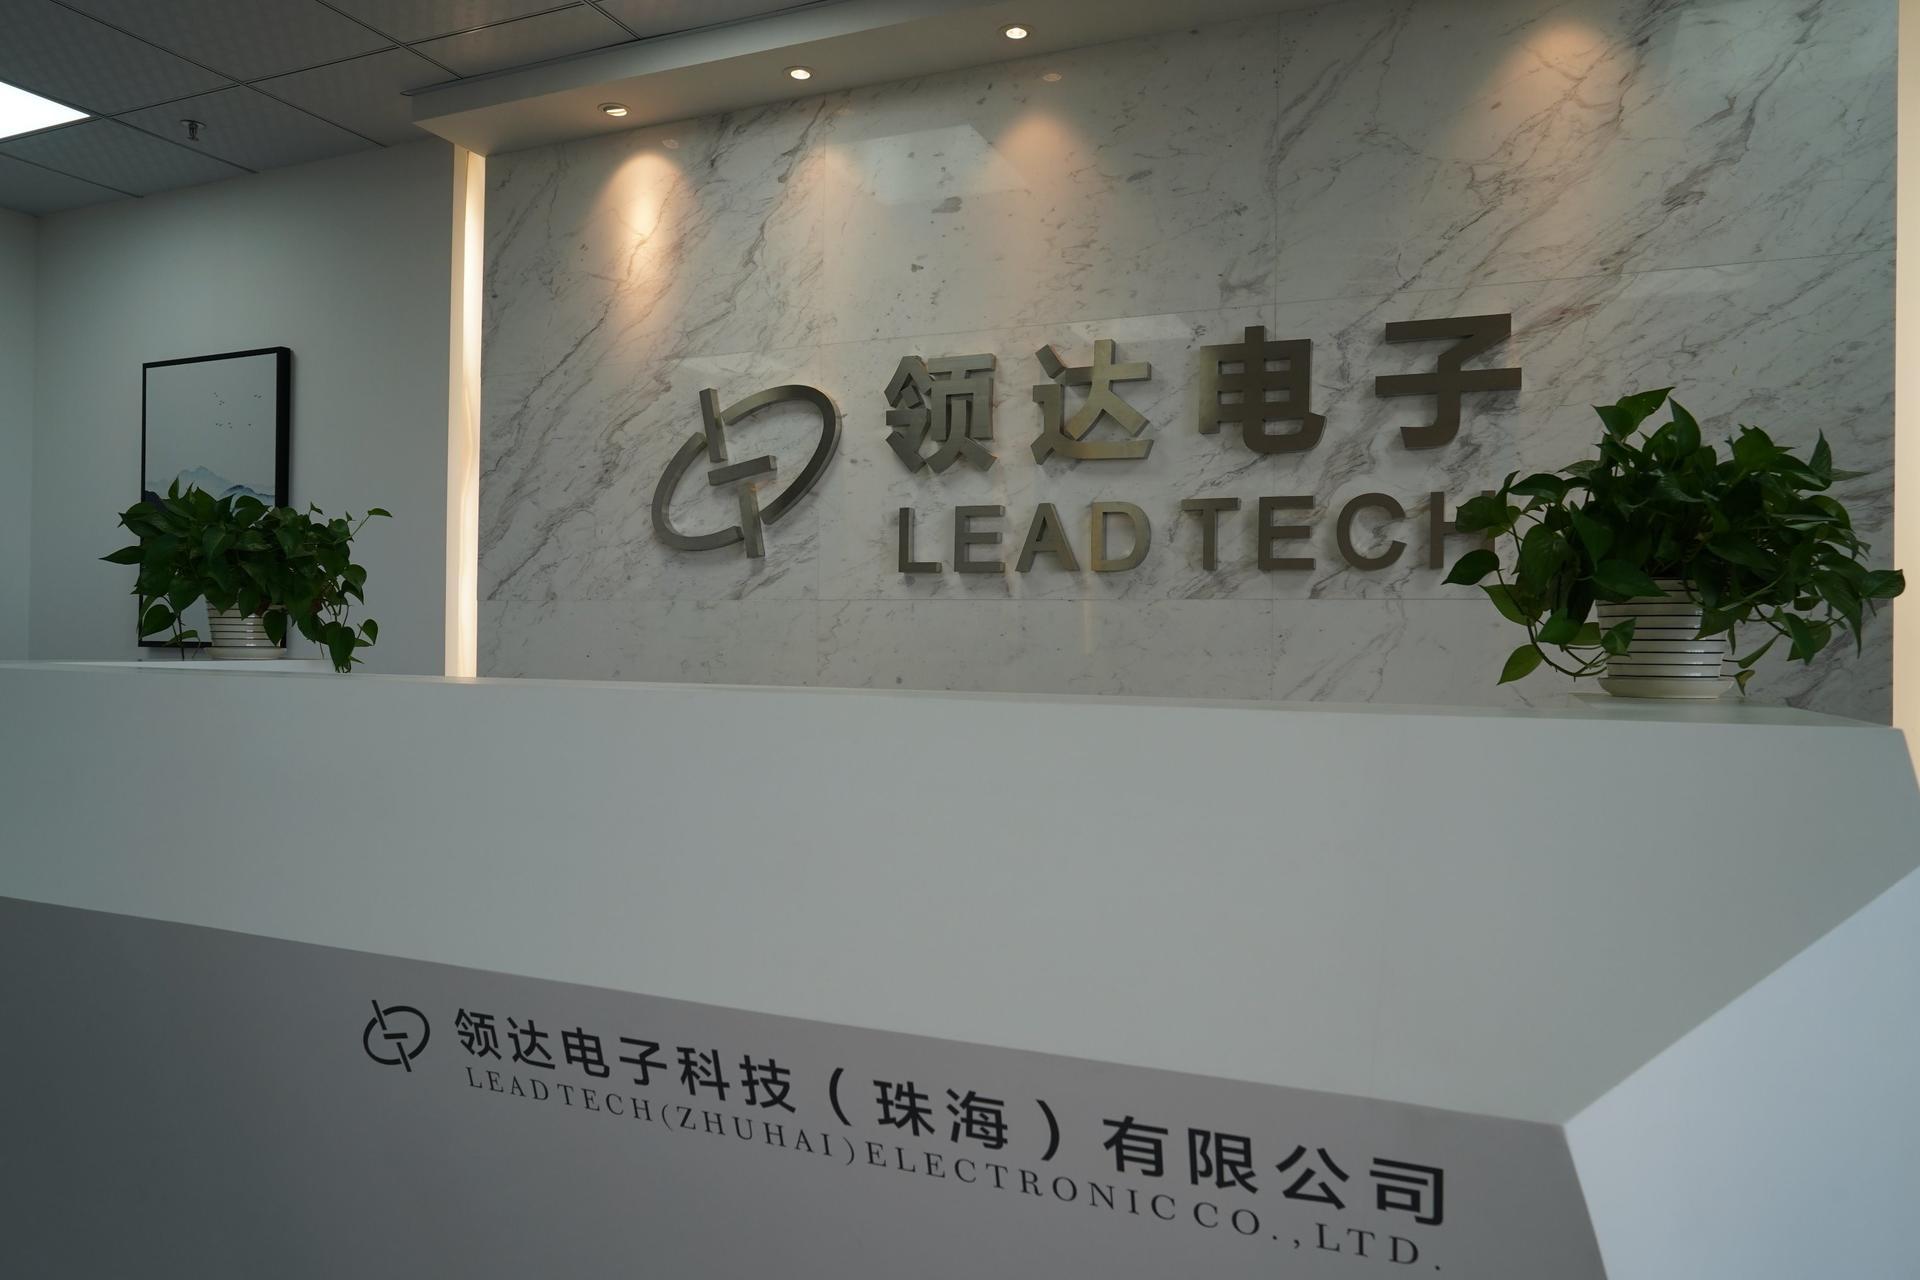 Lead Tech Lt800 Stable High Speed 4 Lines Cij Inkjet Printer